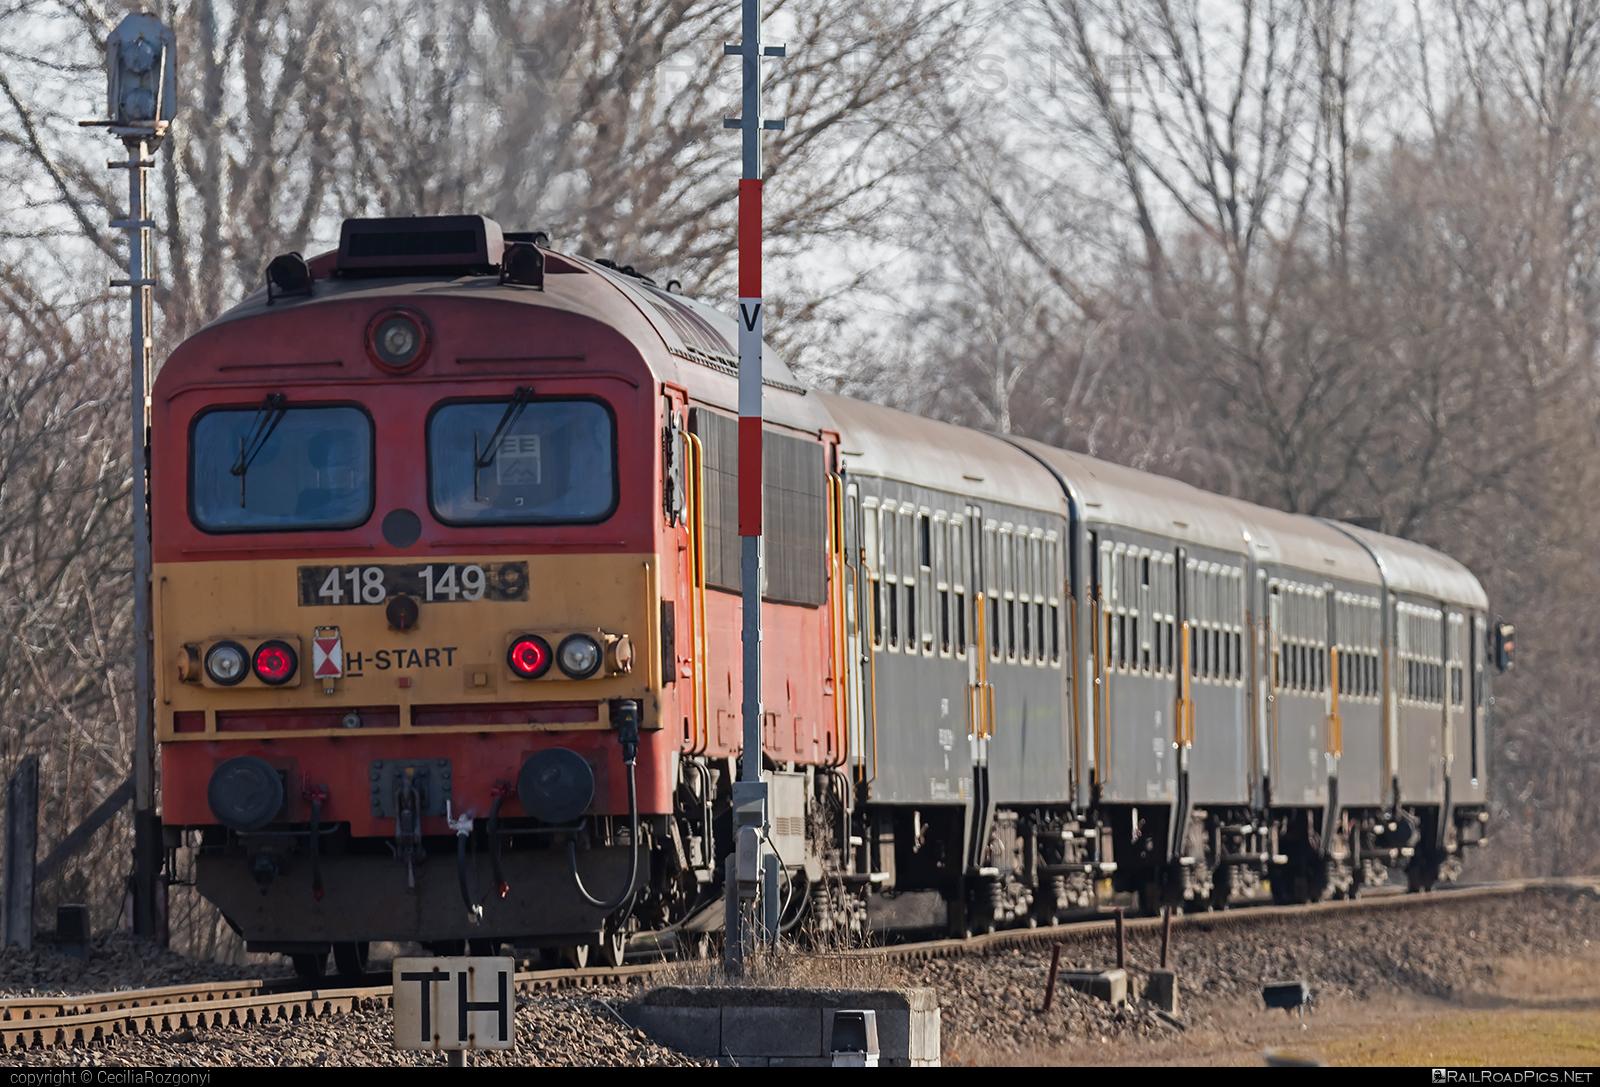 Ganz-MÁVAG DHM7-5 - 418 149 operated by MÁV-START ZRt. #dhm7 #dhm75 #ganzm41 #ganzmavag #ganzmavag418 #ganzmavagdhm7 #ganzmavagdhm75 #ganzmavagm41 #m41locomotive #mav #mavstart #mavstartzrt